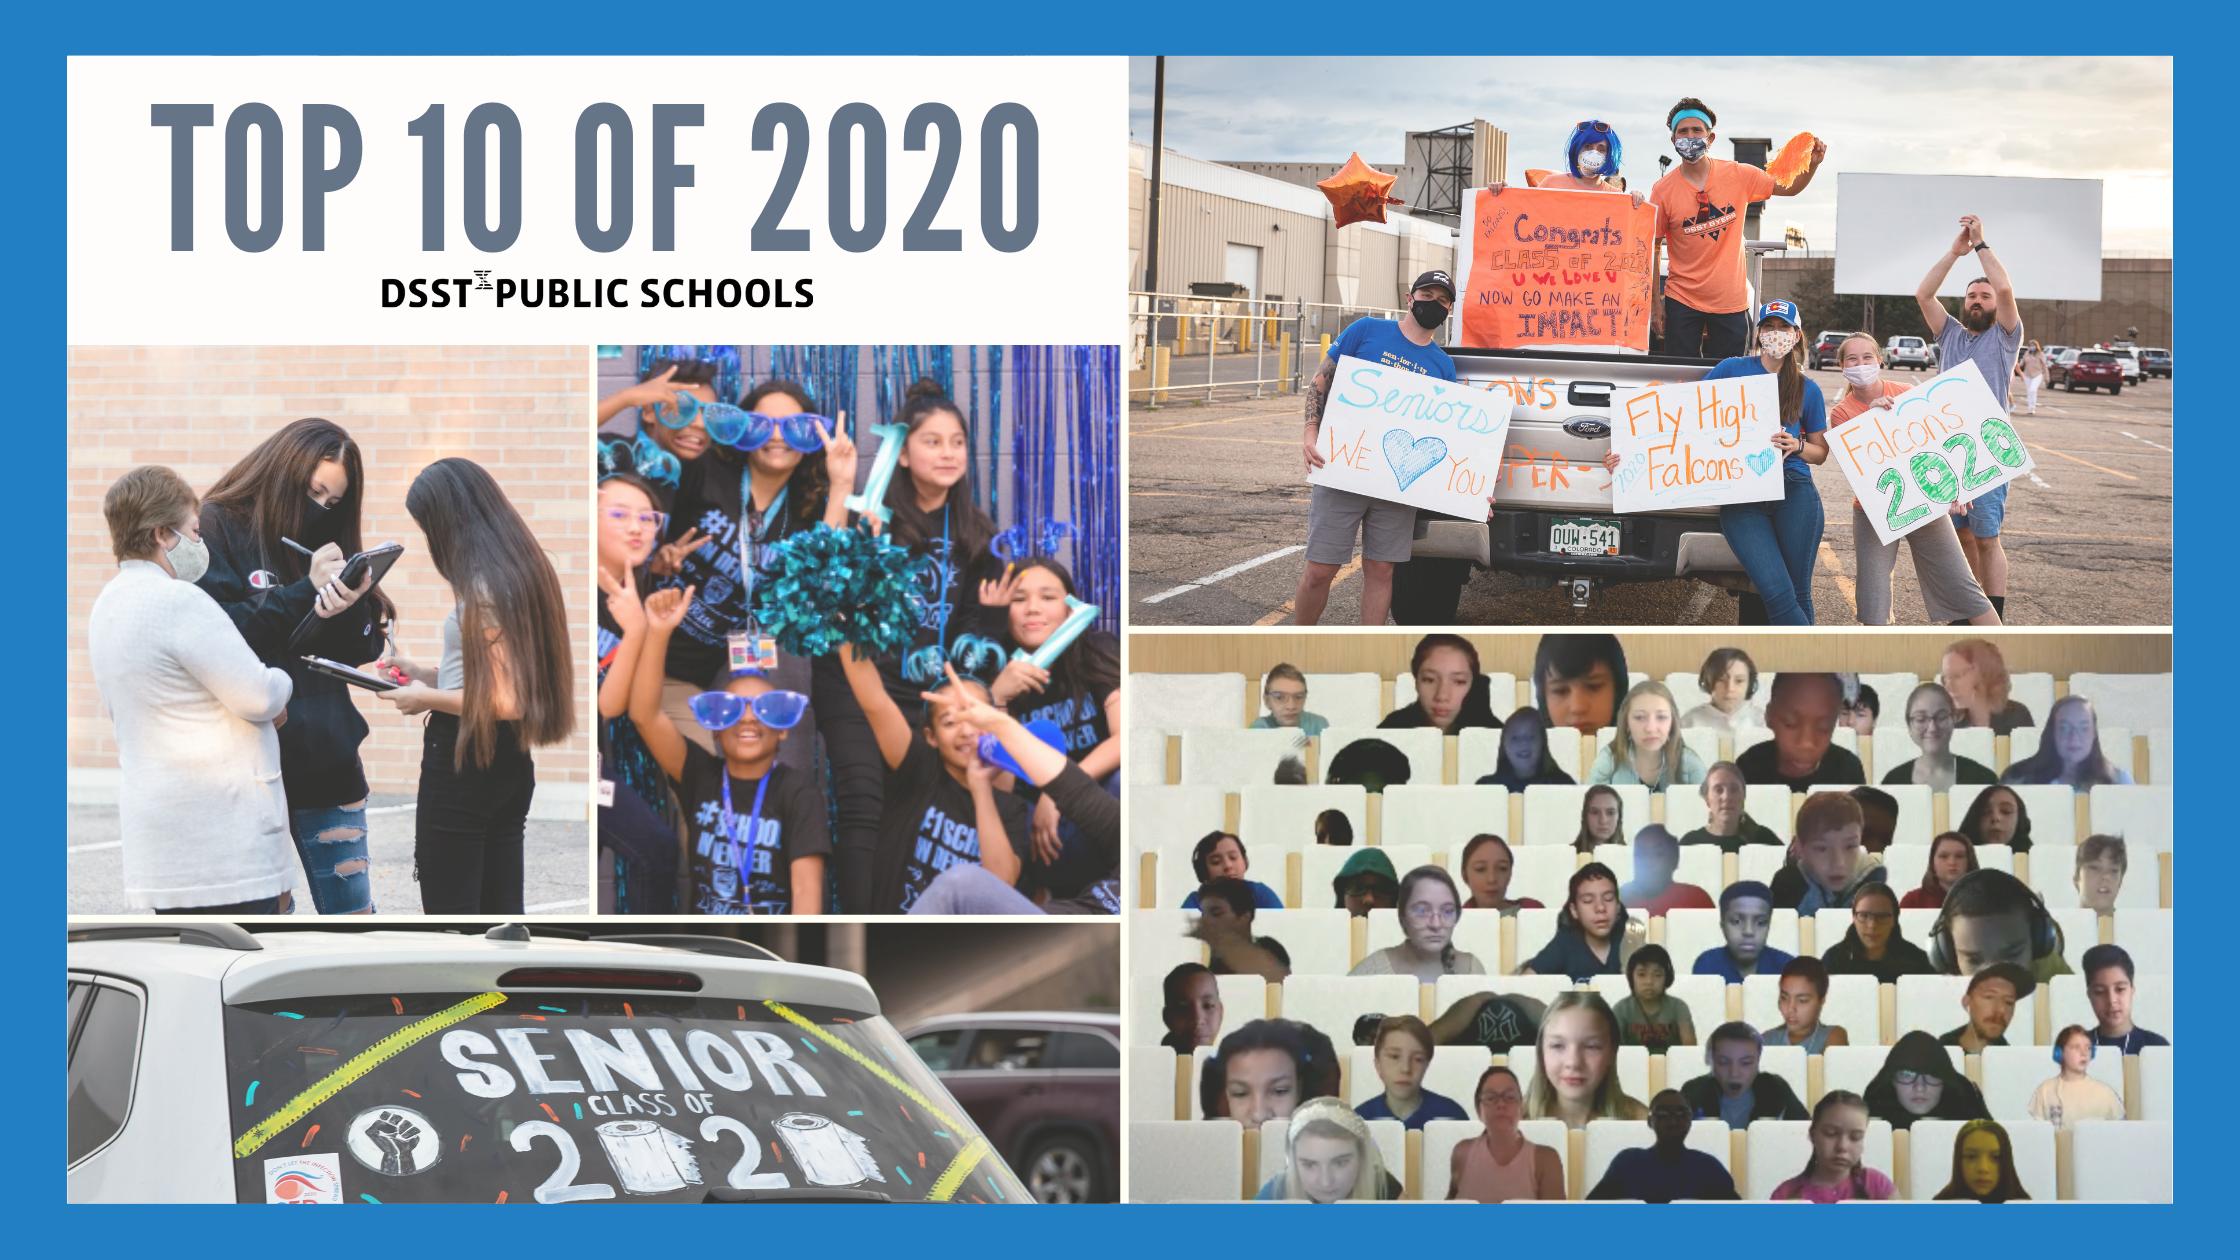 Top 10 of 2020 Blog Banner